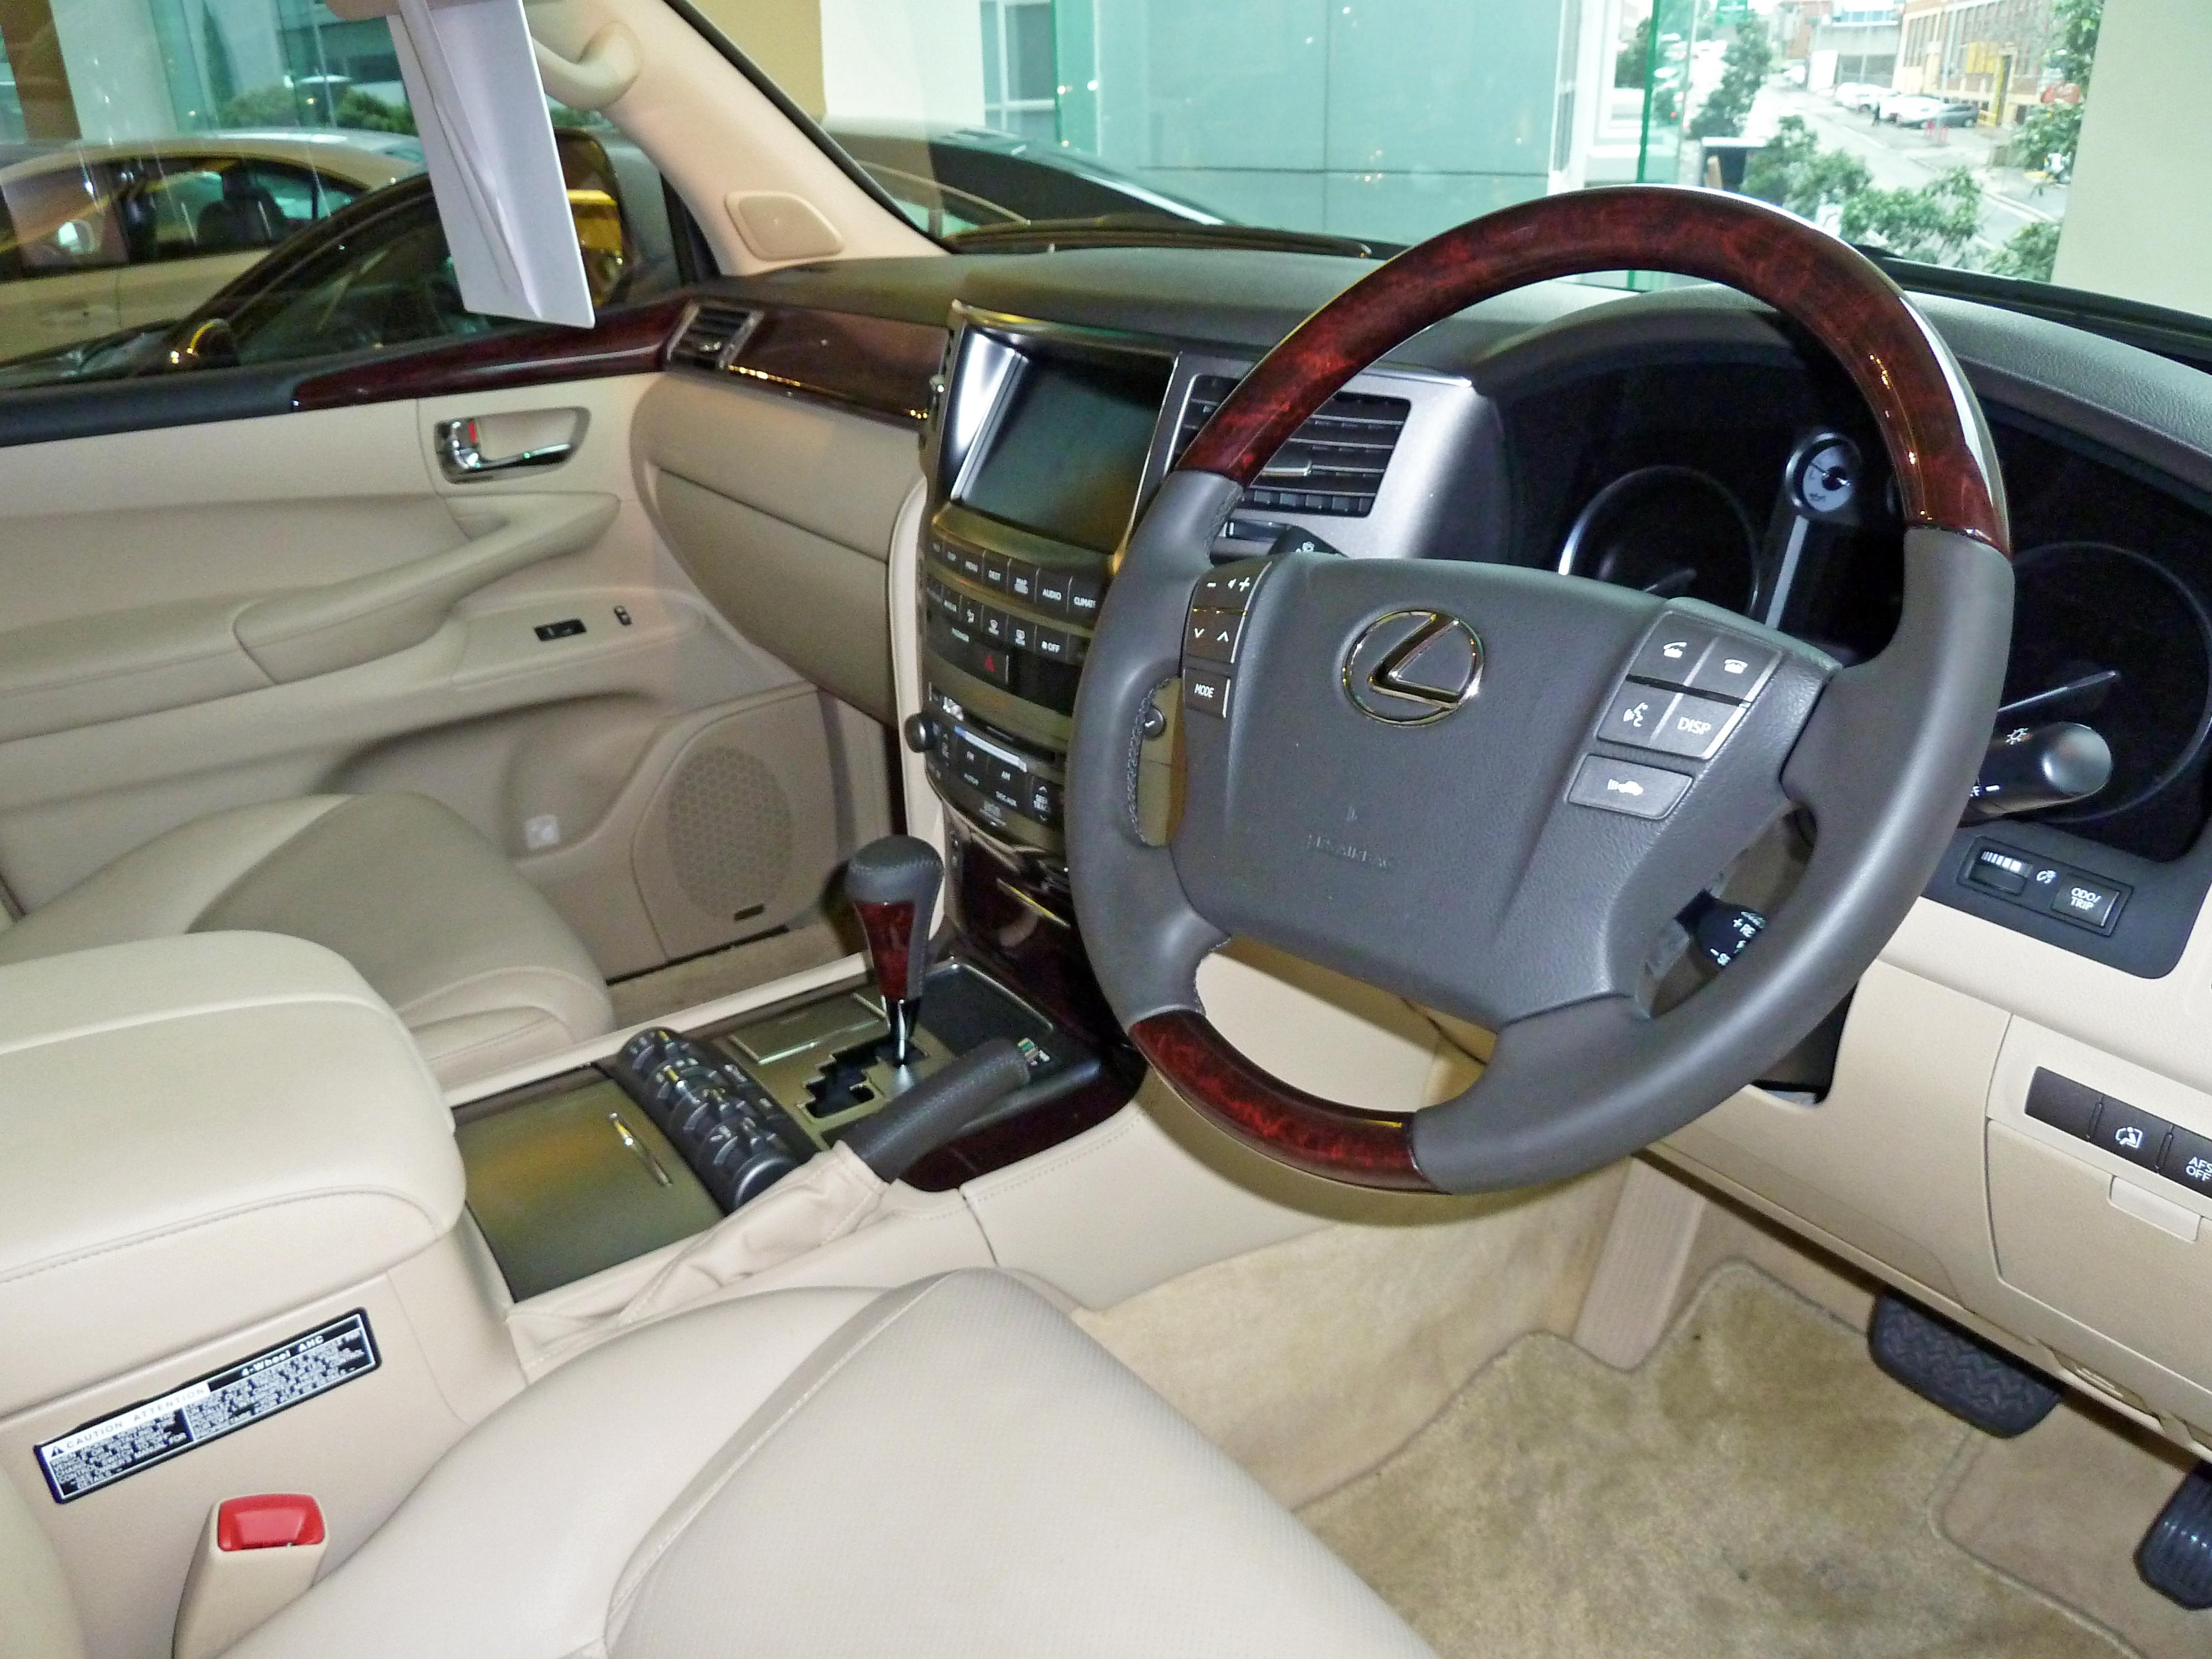 https://upload.wikimedia.org/wikipedia/commons/e/e1/2008_Lexus_LX_570_%28URJ201R%29_Sports_Luxury_wagon_02.jpg